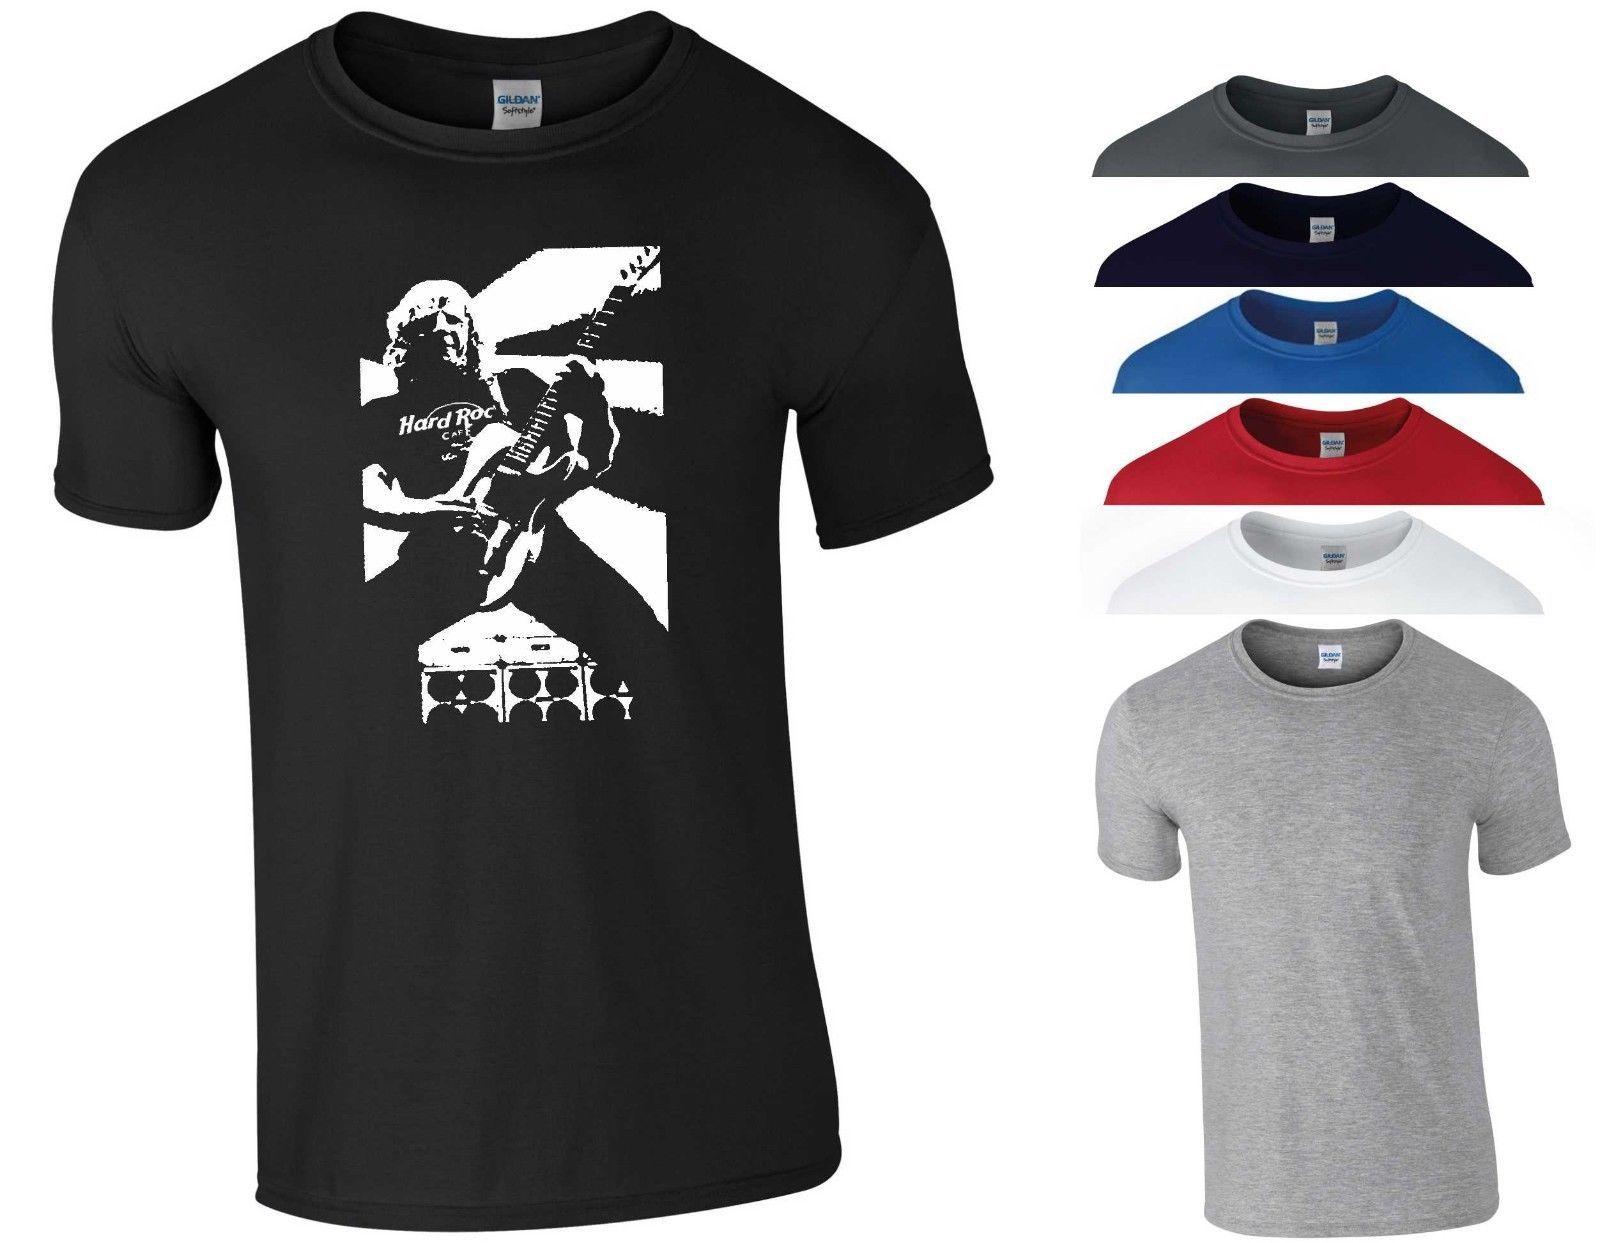 f44c2db0 Eat Sleep Ski Tshirt Skiing Downhill Cross Country XC Touring T Shirt M XXL  NEW Funny Unisex Casual Tee Gift Cool Looking T Shirts Buy Designer Shirts  From ...